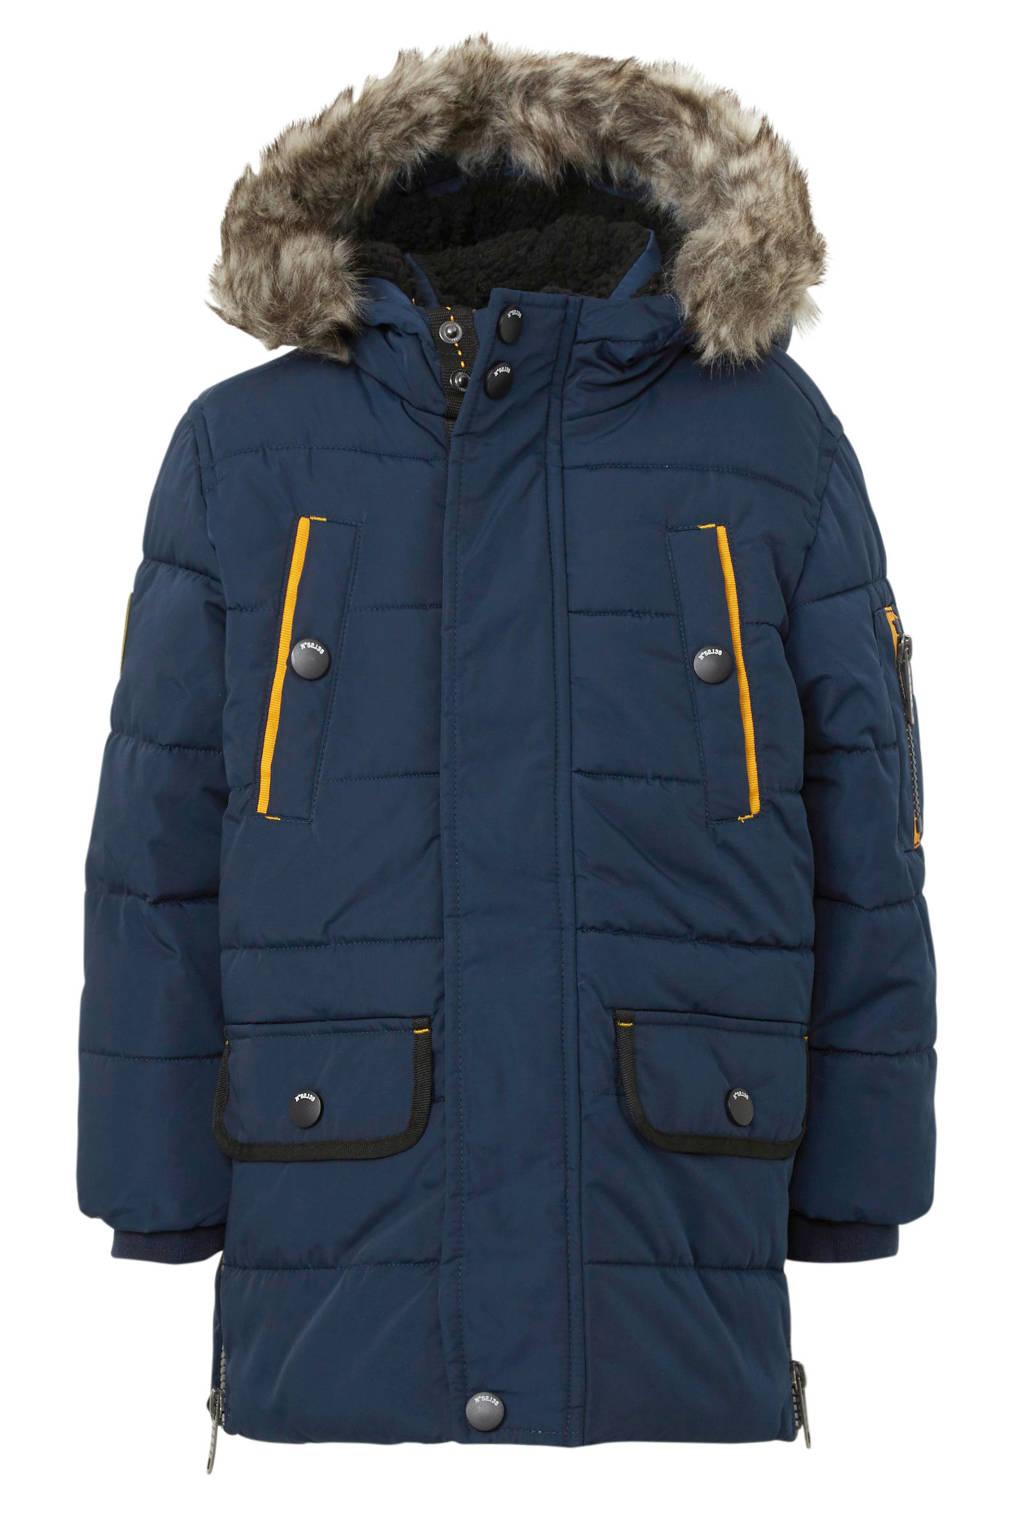 C&A Palomino winterjas met patches donkerblauw/geel, Donkerblauw/geel